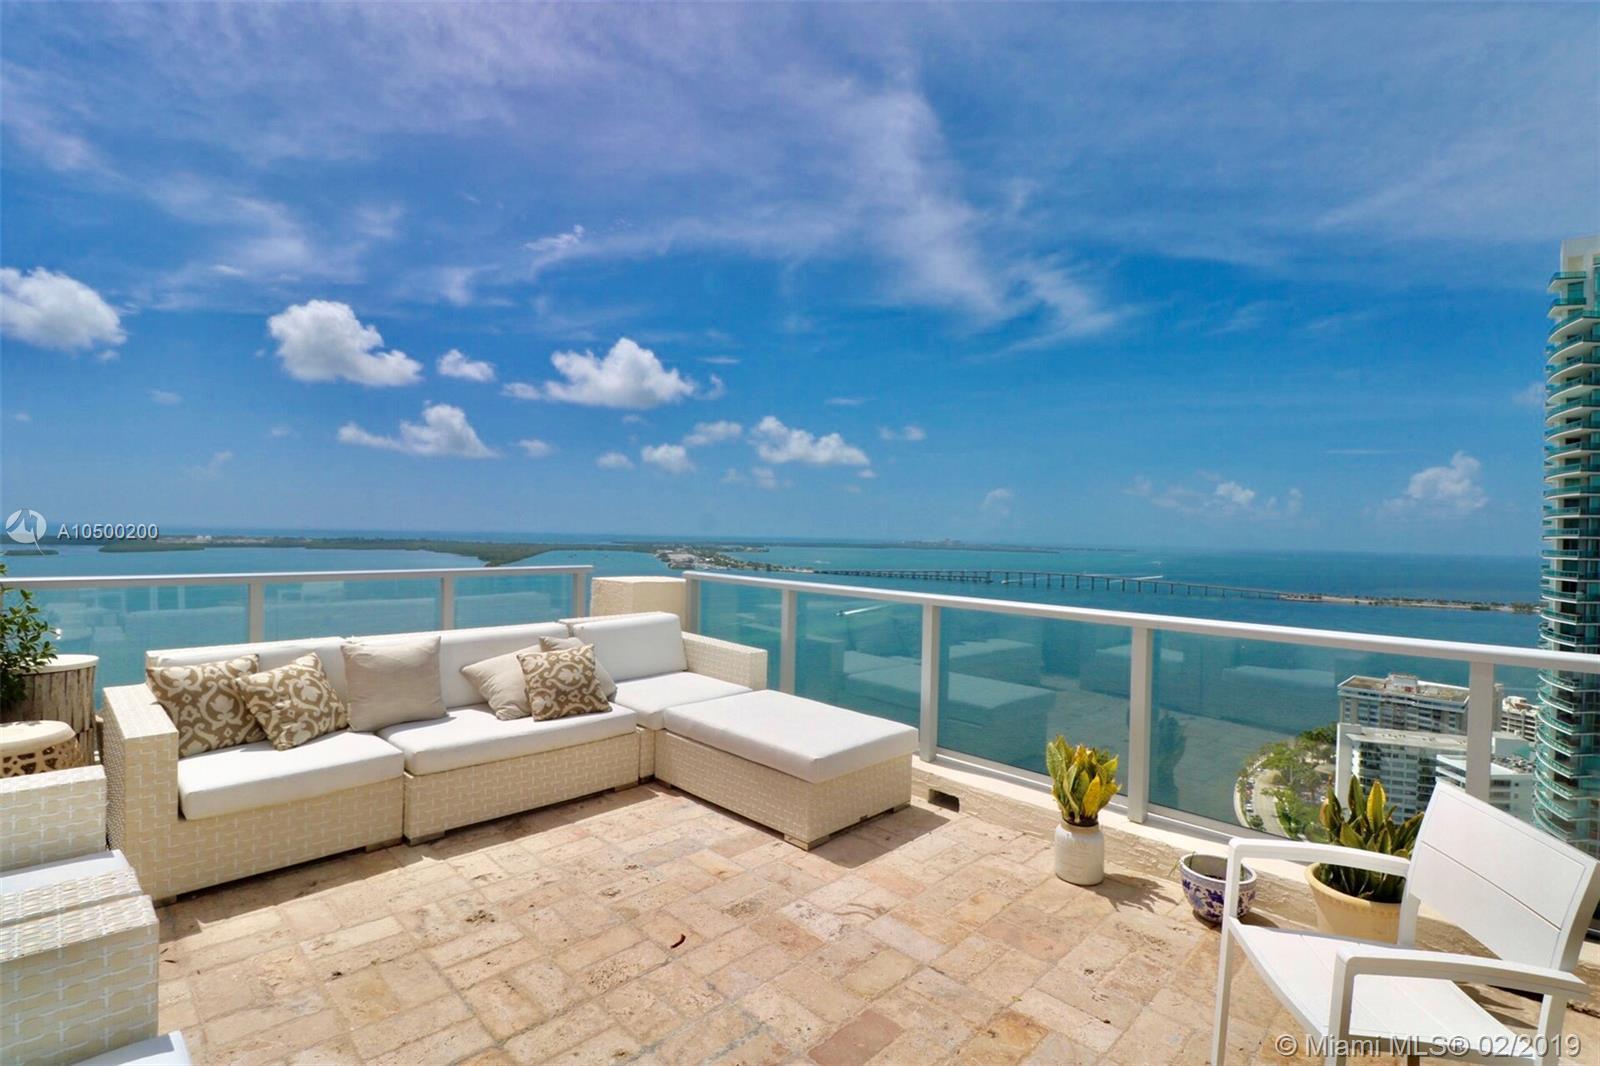 1155 Brickell Bay Dr, Miami, Florida 33131, 3 Bedrooms Bedrooms, 1 Room Rooms,3 BathroomsBathrooms,Residential,For Sale,1155 Brickell Bay Dr,A10500200